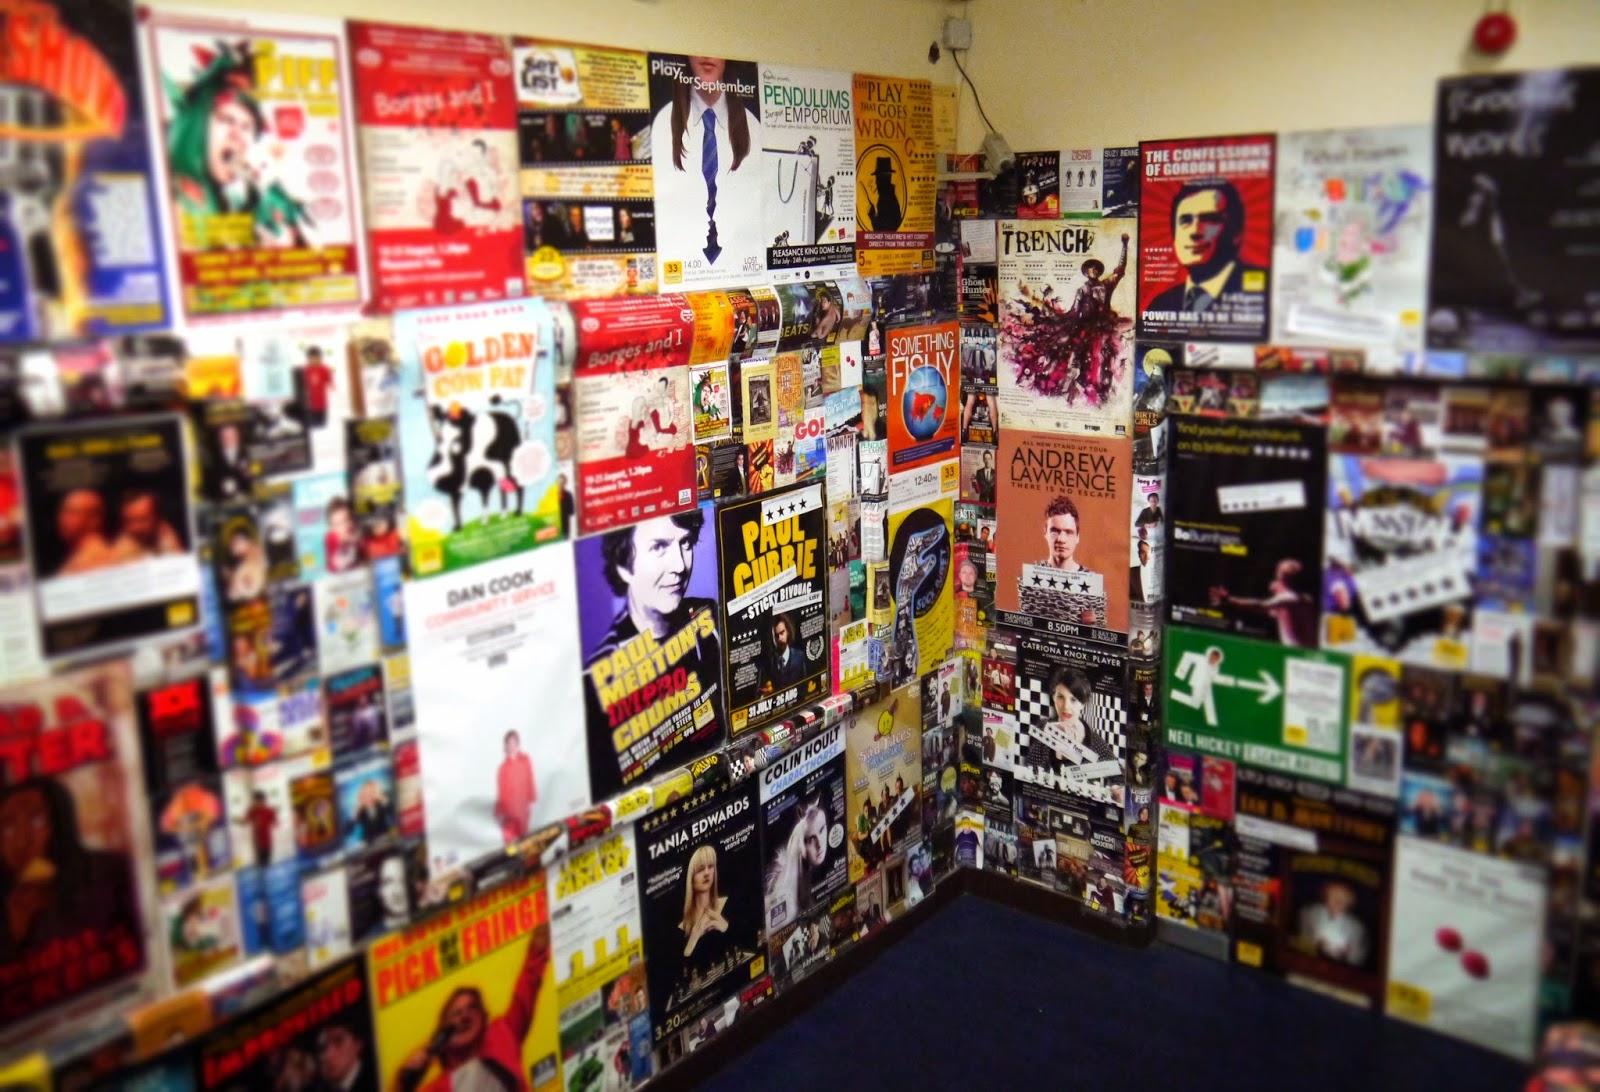 Edinburgh Fringe Pleasance Dome Posters